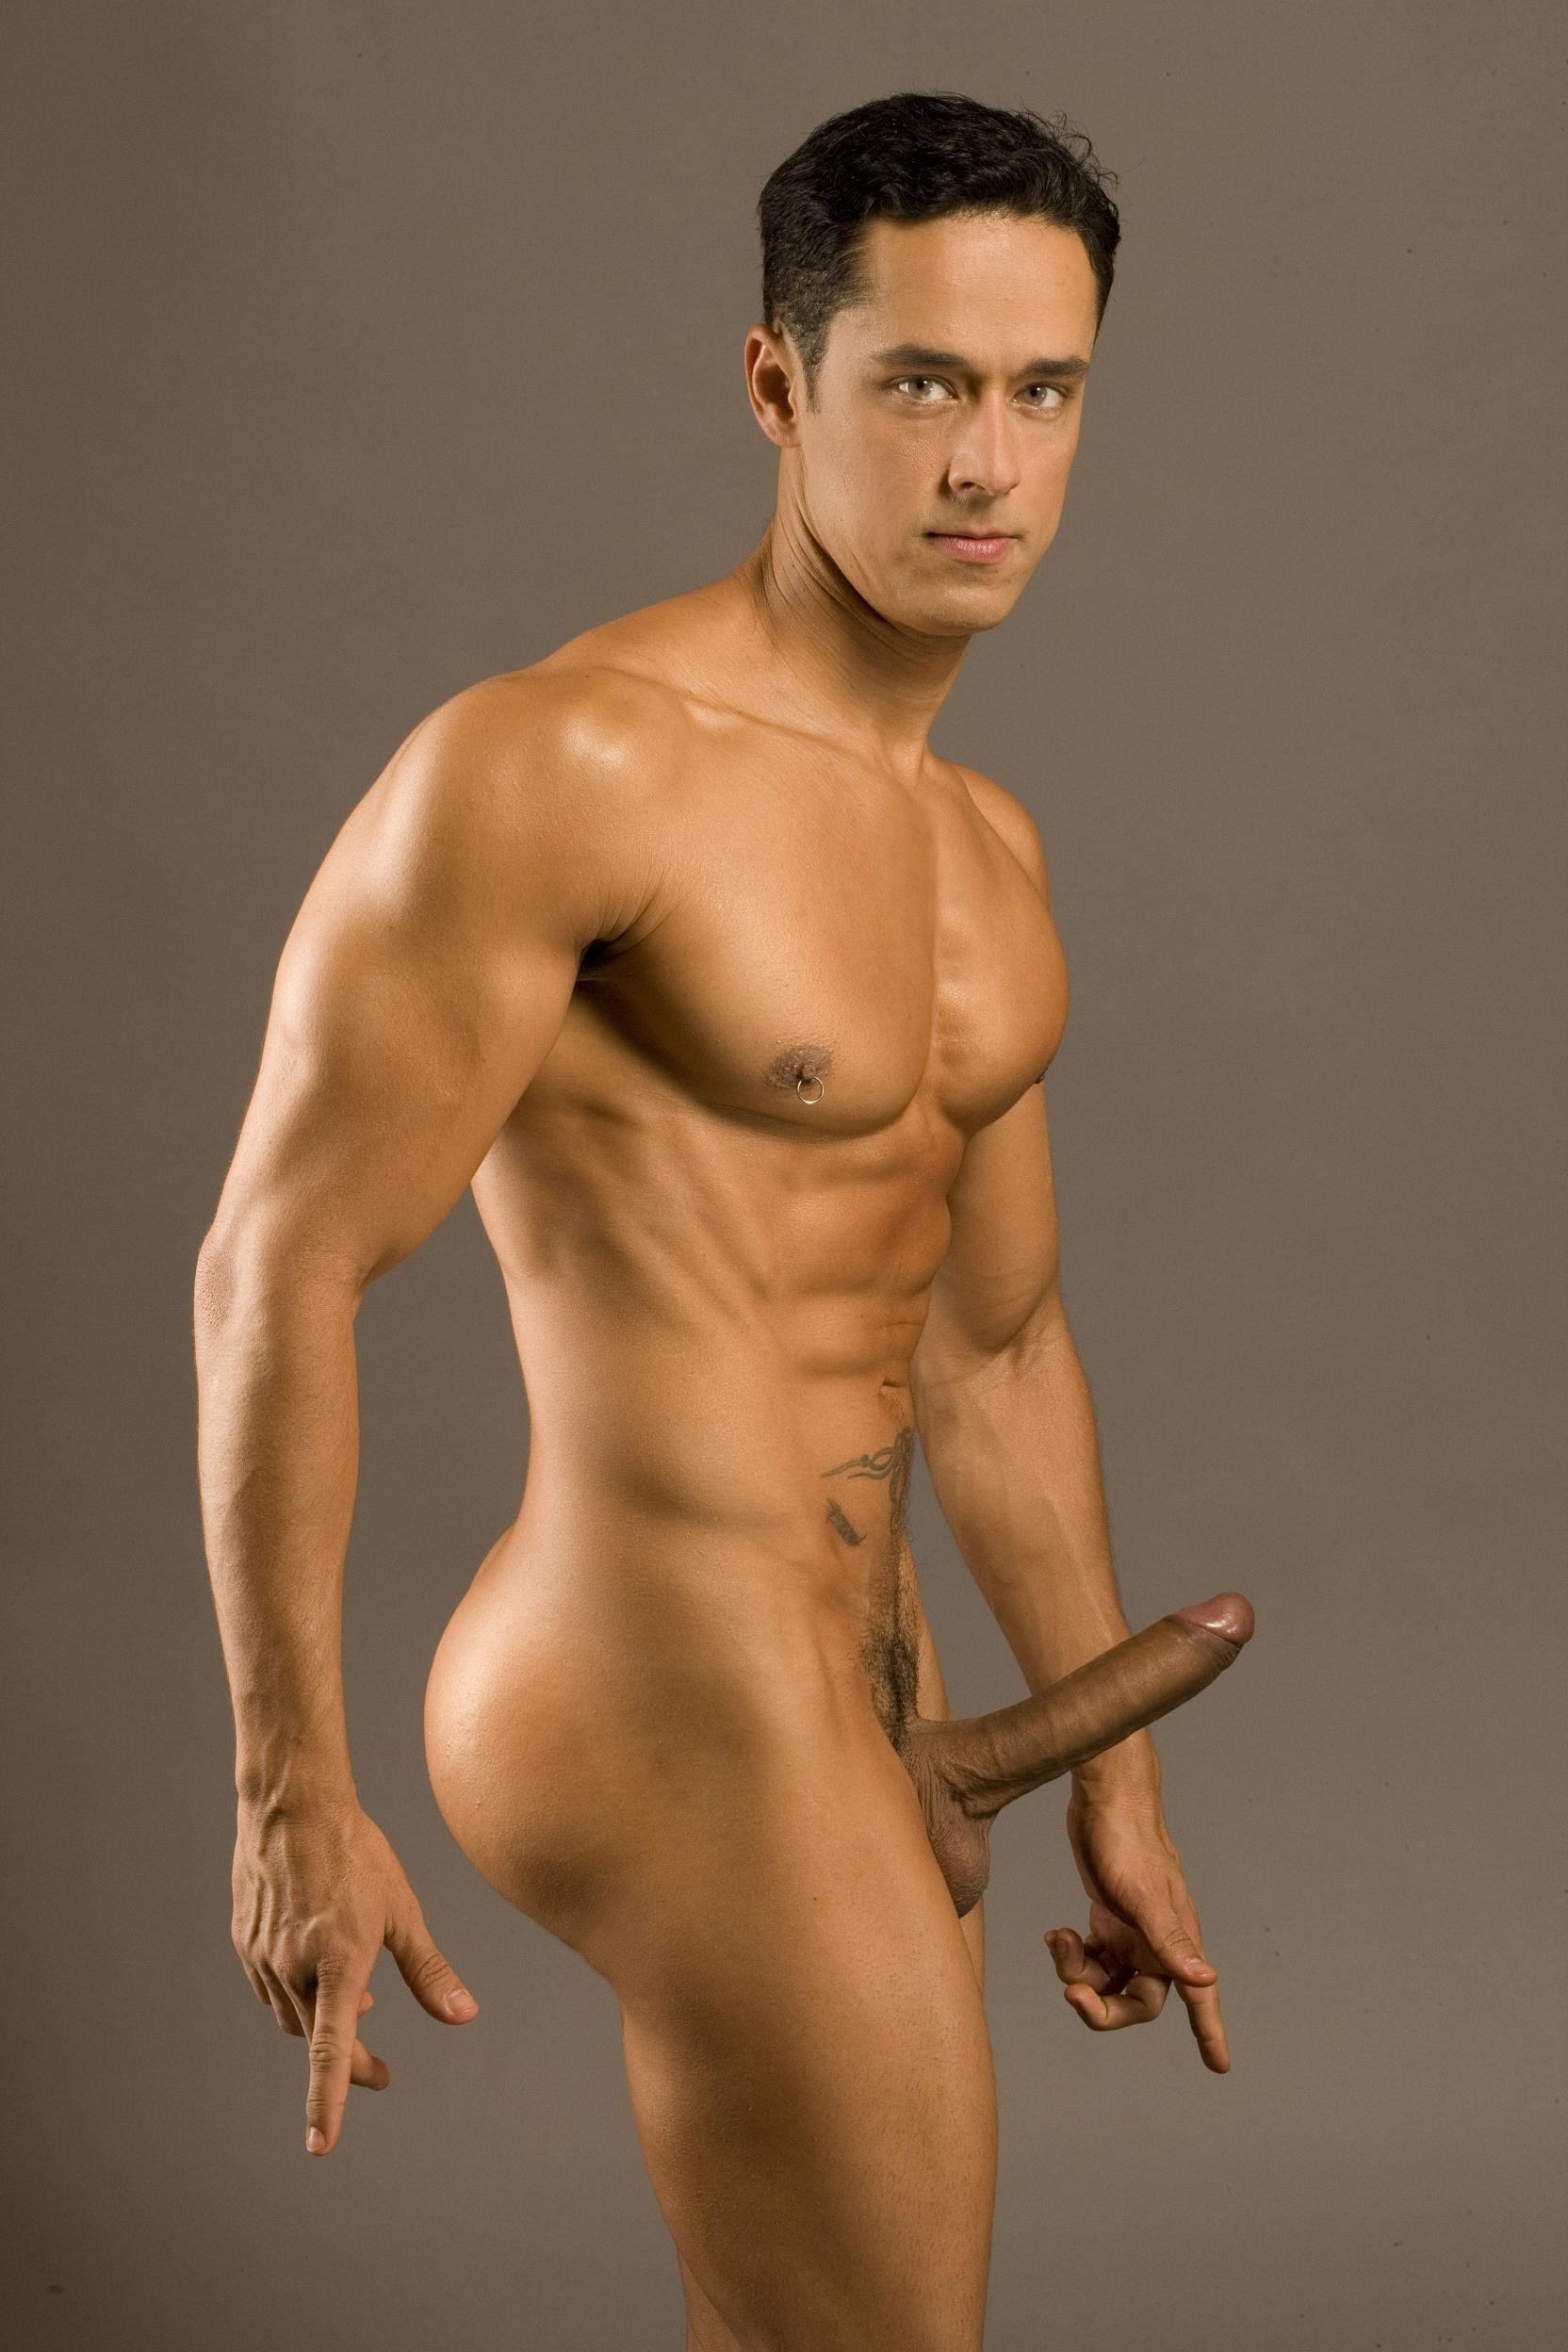 Фото голых мужчин артистов 26 фотография